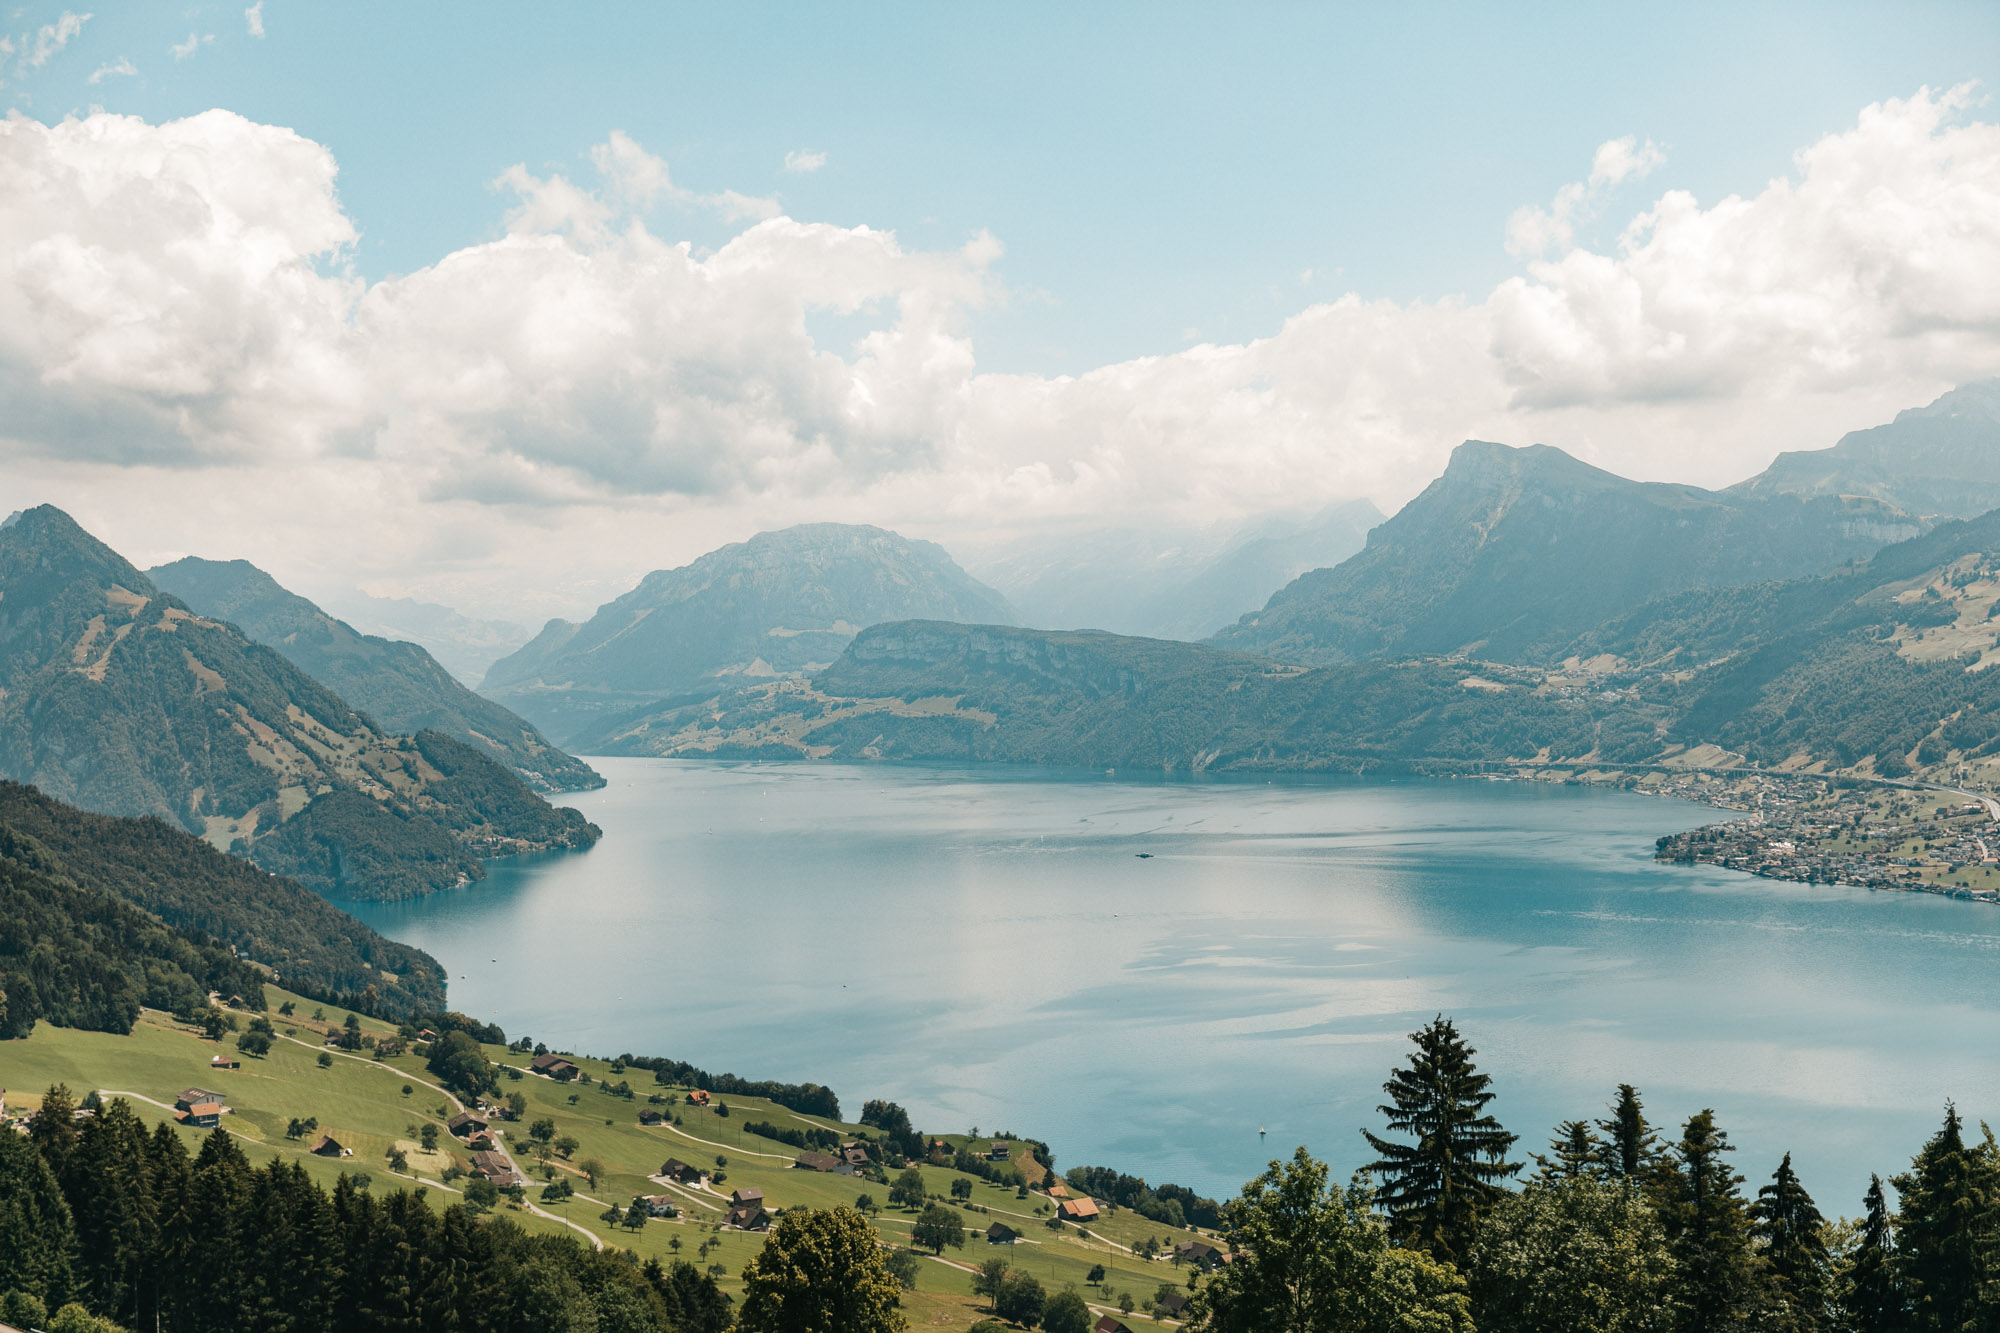 SwitzerlandBlog_HBGOODIE2018 (52 of 58).jpg